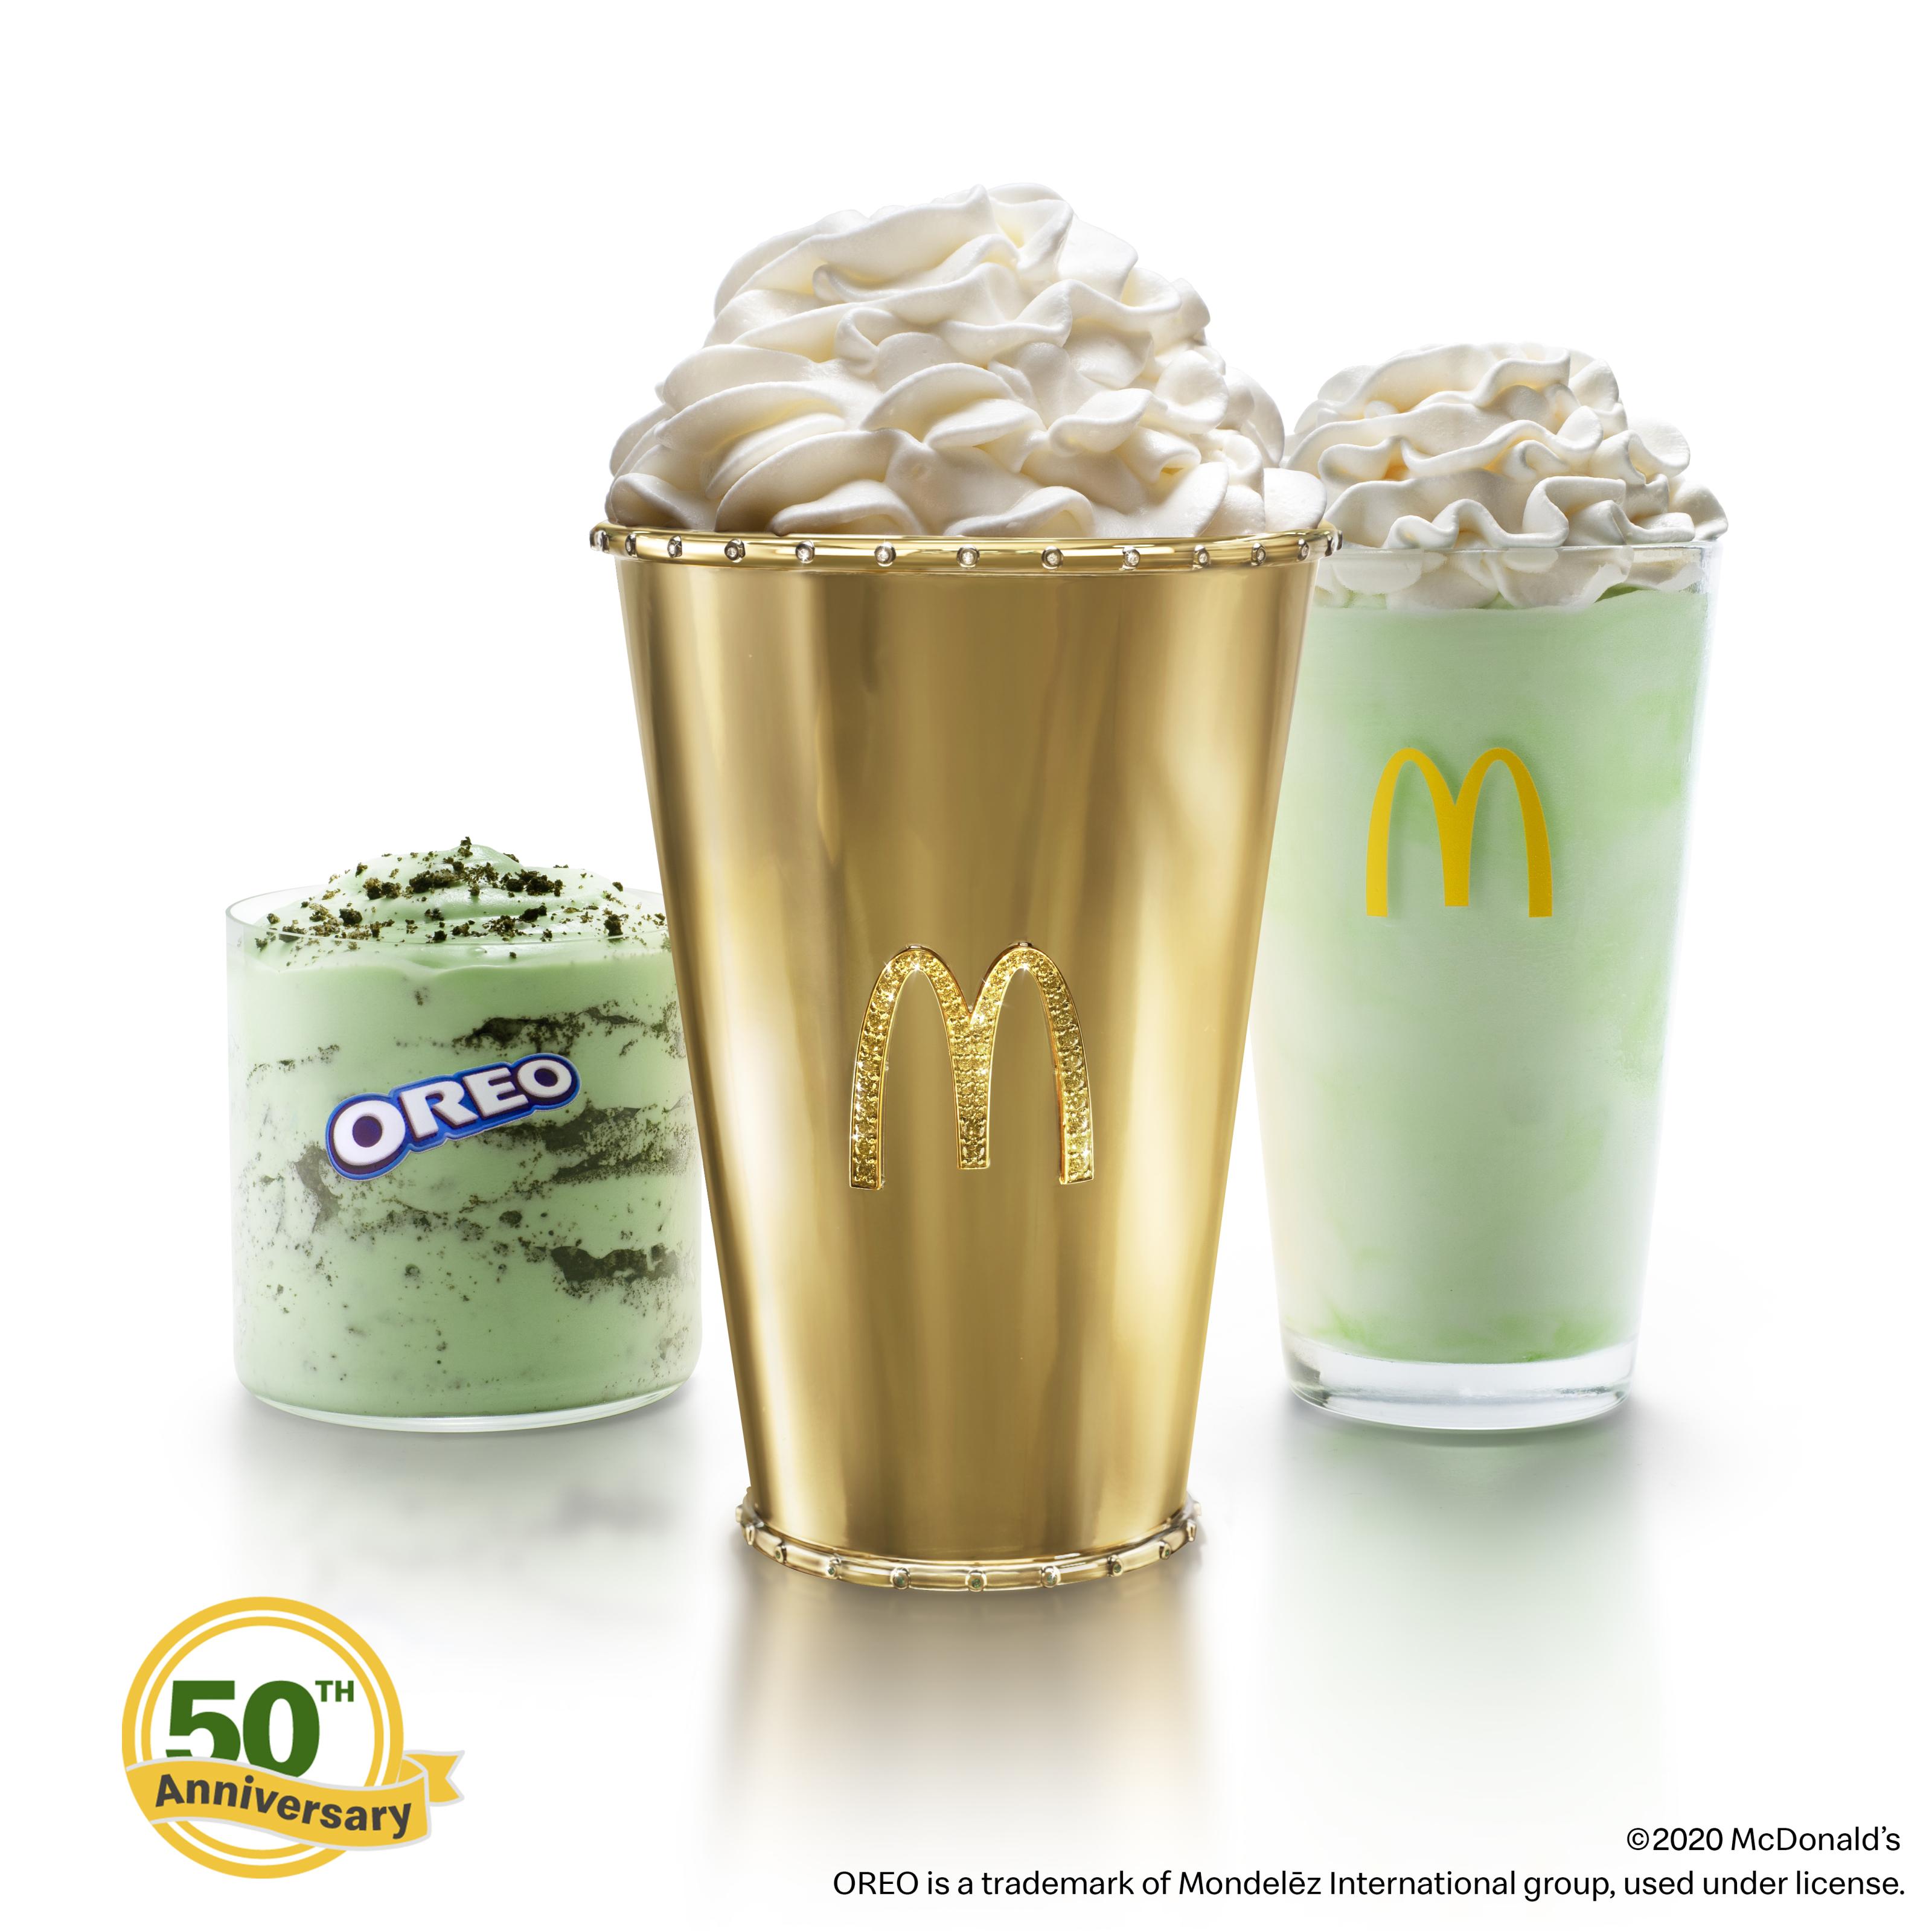 McDonald's Golden Shamrock Shake is the ultimate Shamrock Shake